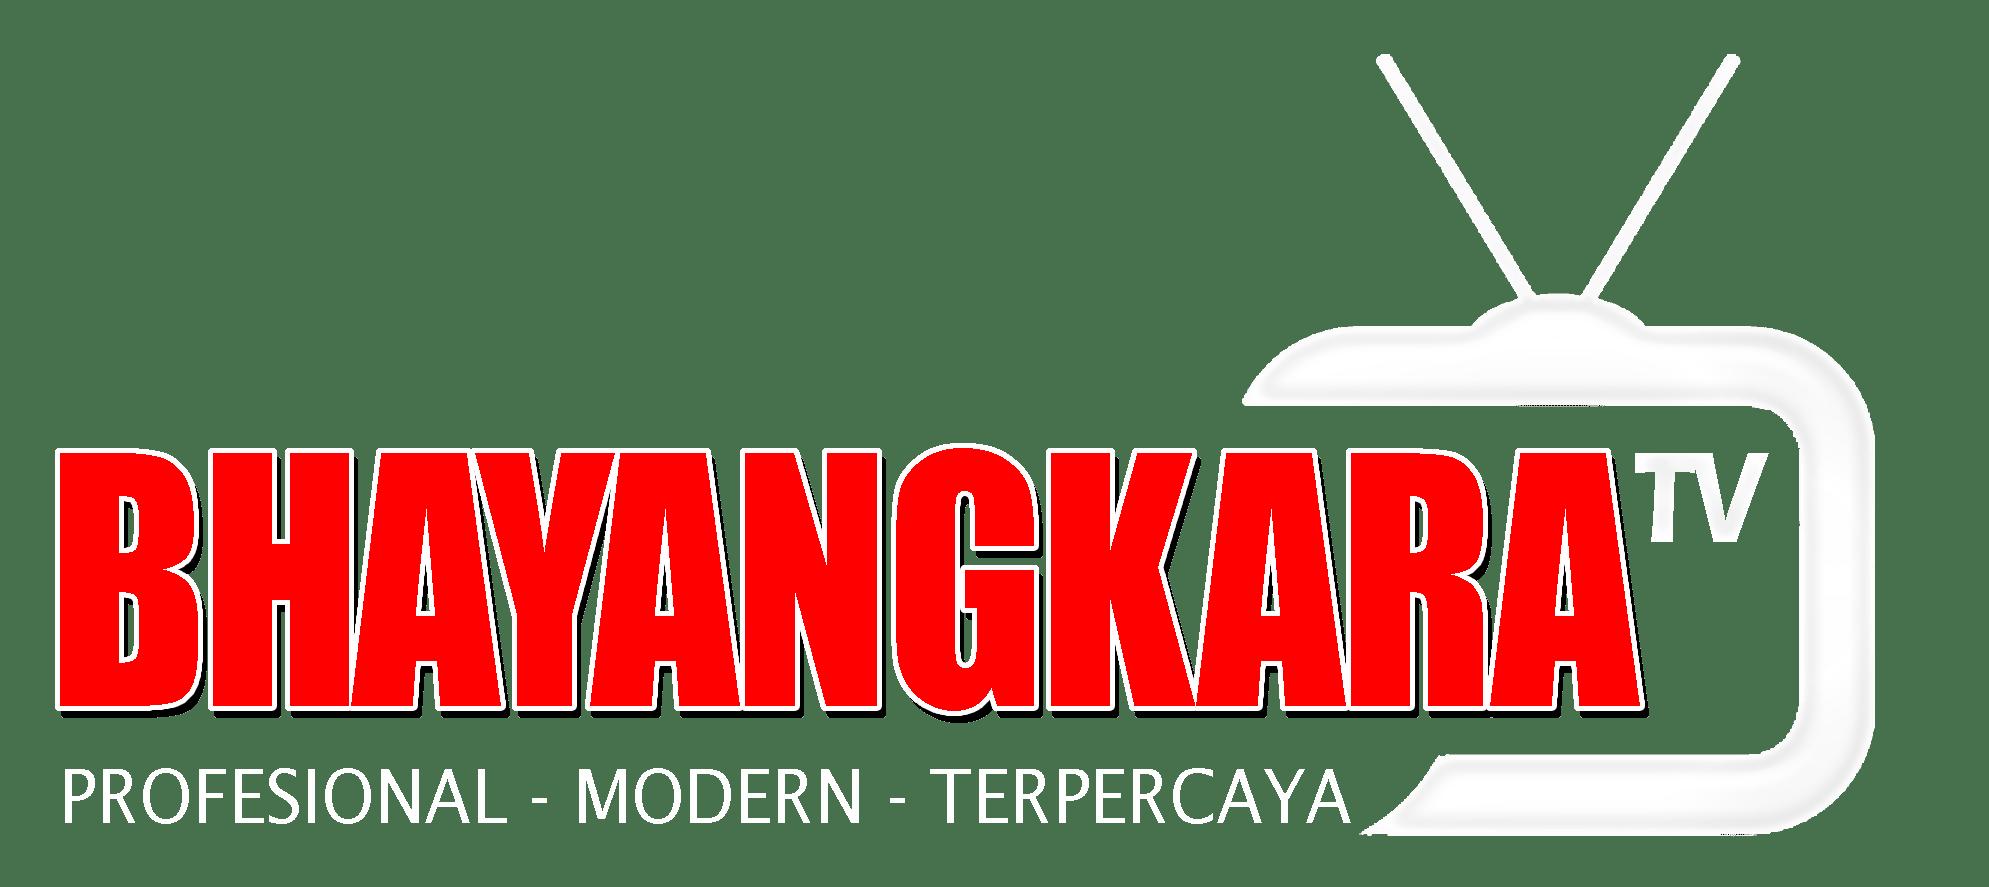 Bhayangkara TV